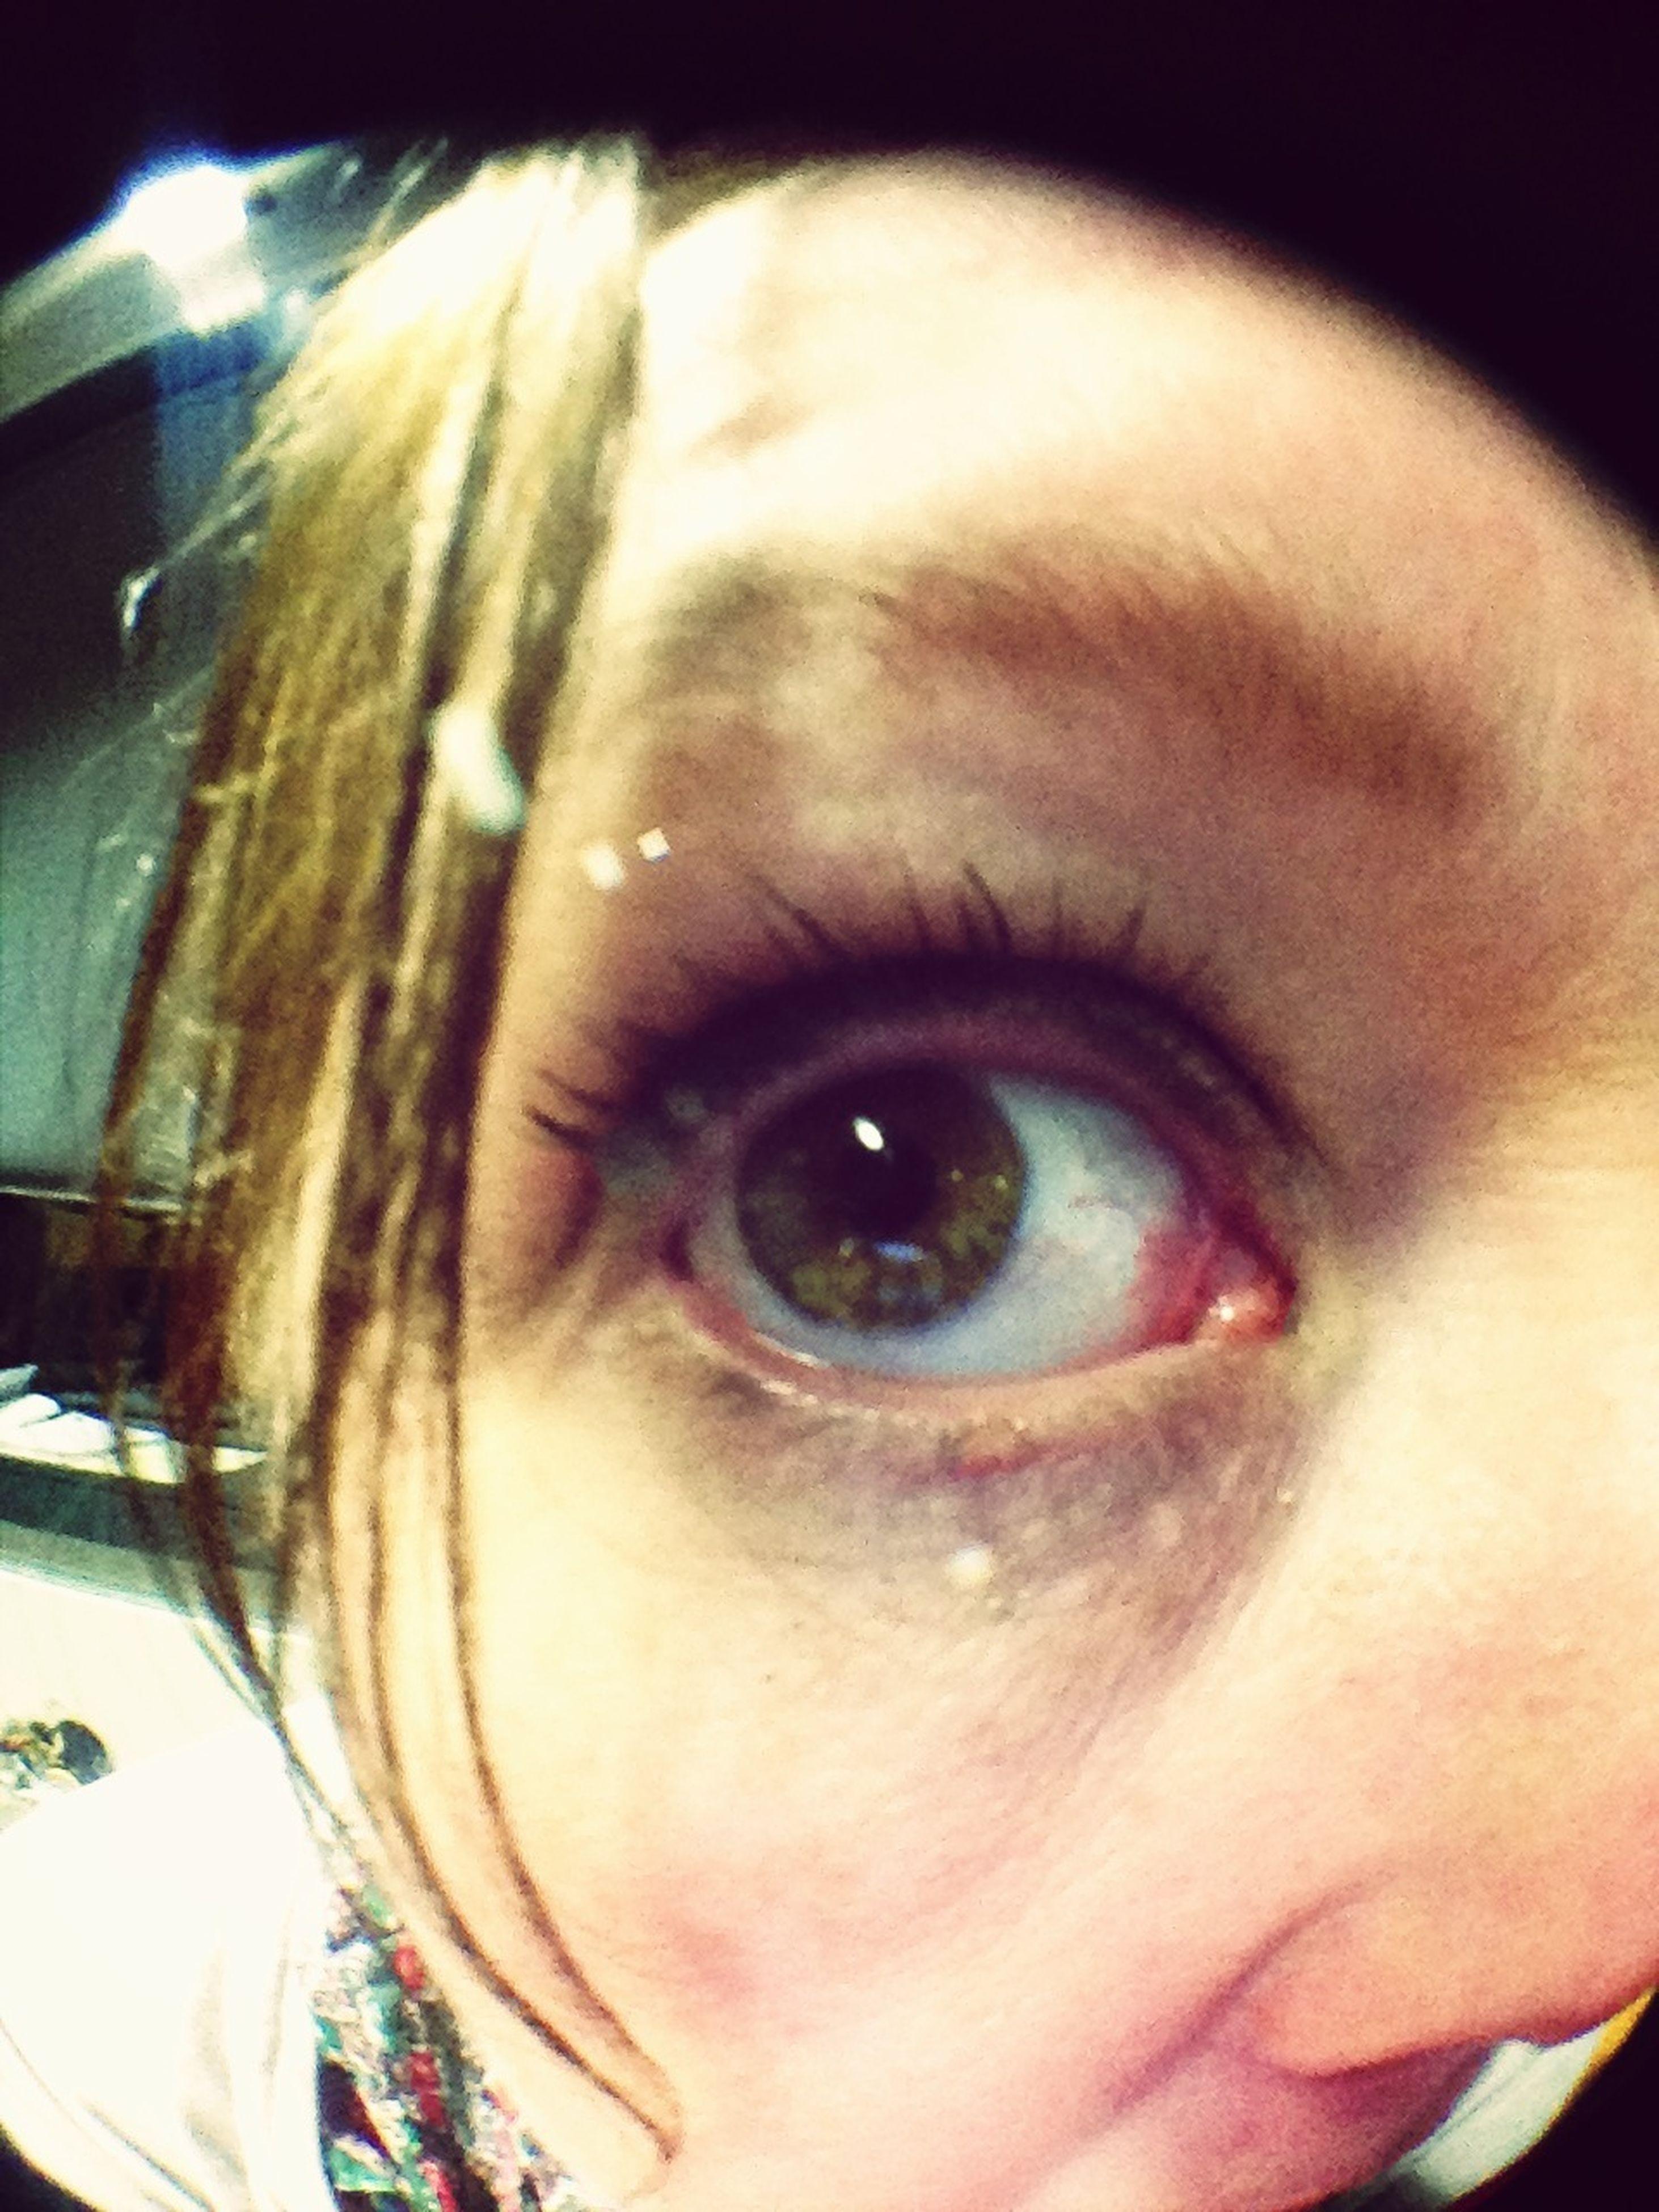 close-up, human eye, looking at camera, portrait, headshot, human face, eyelash, eyesight, indoors, extreme close-up, extreme close up, eyebrow, sensory perception, part of, blue eyes, front view, eyeball